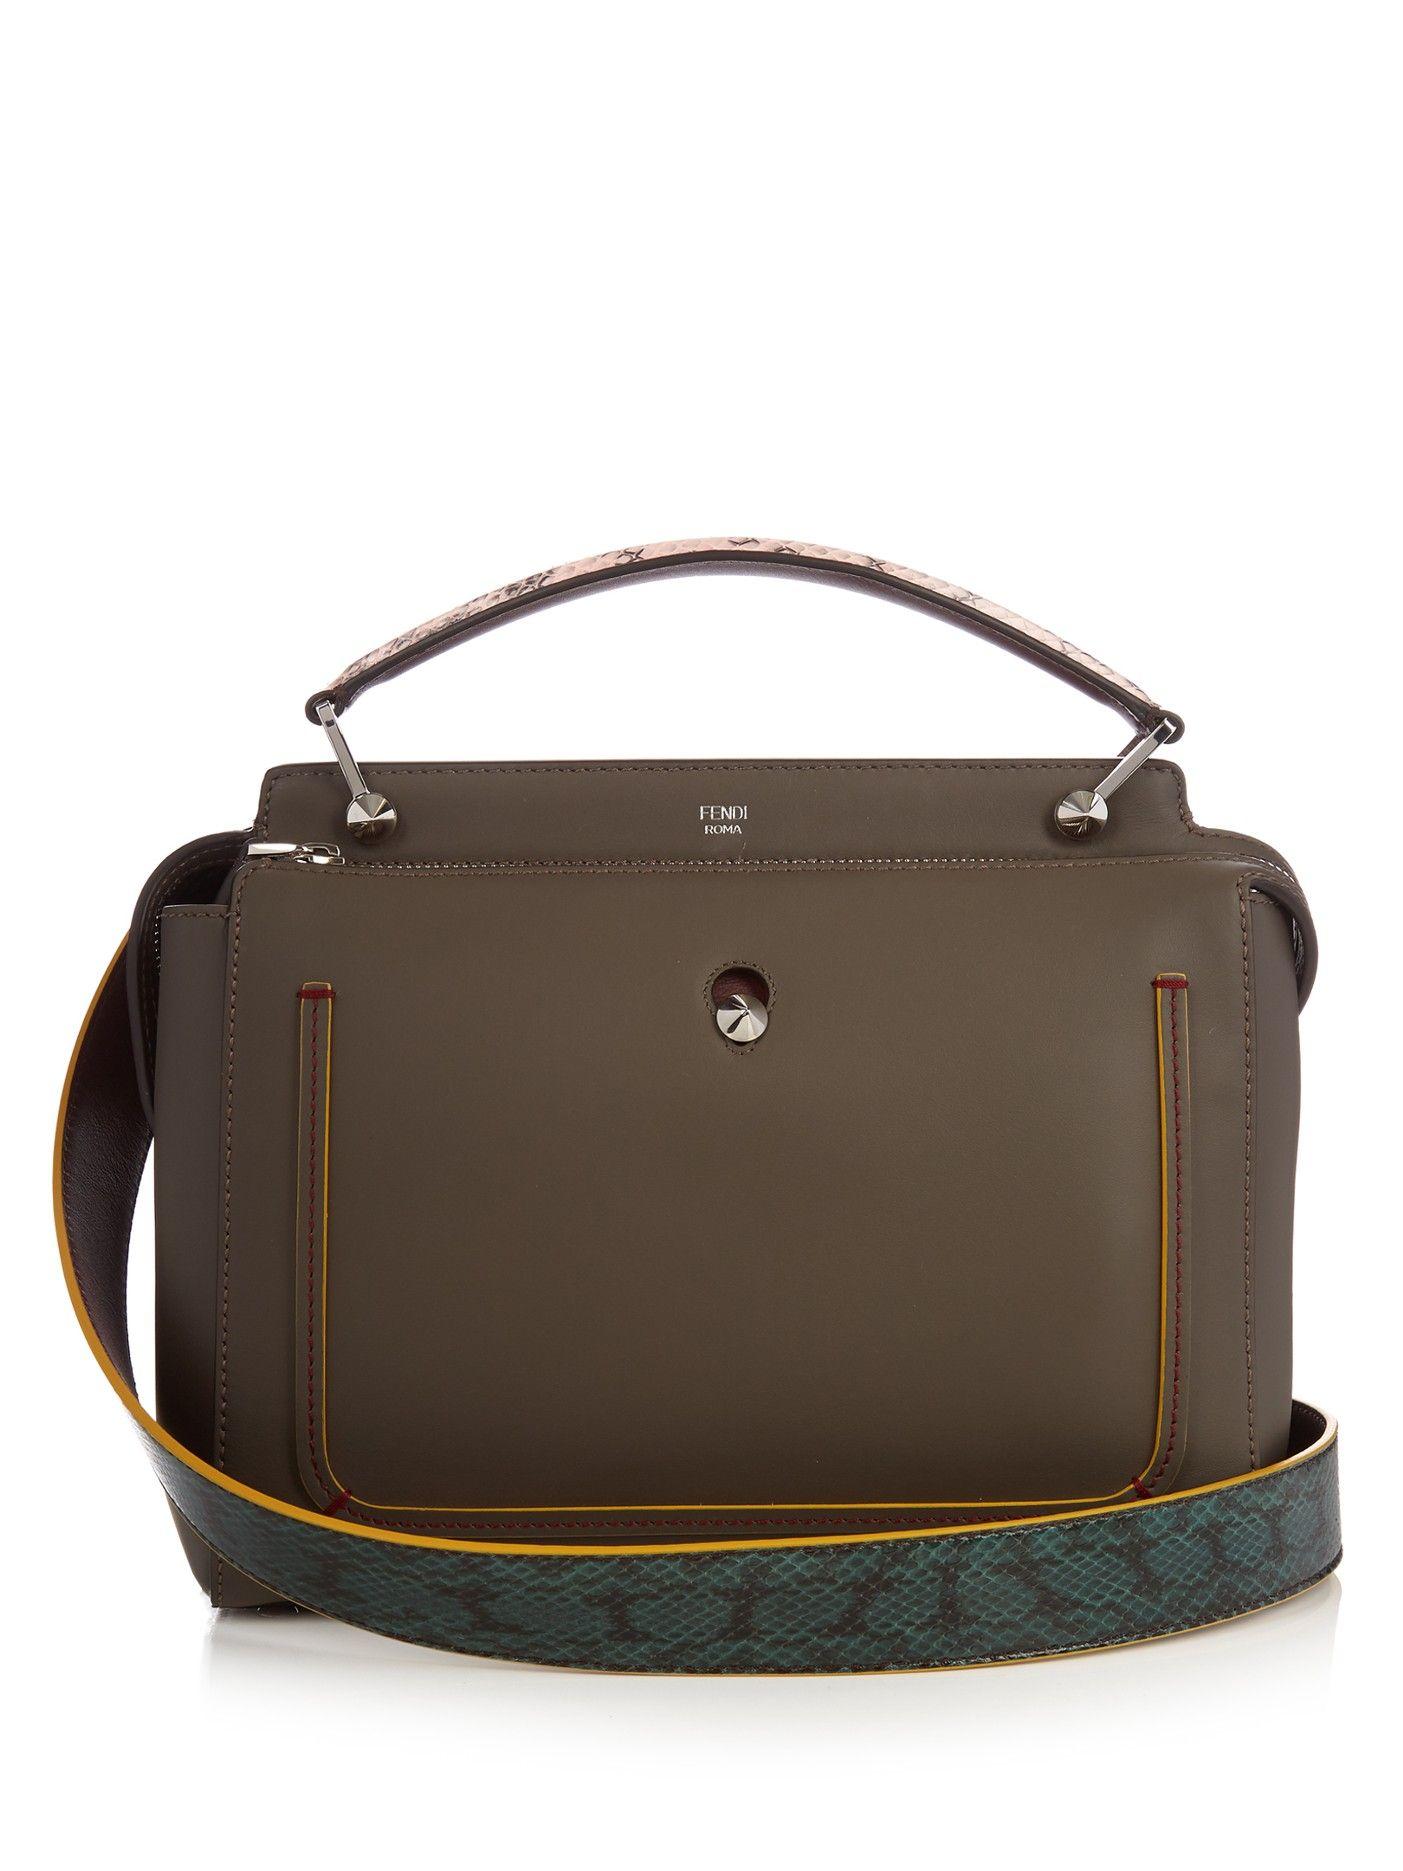 508de2f9365a Fendi Dotcom leather and ayers bag